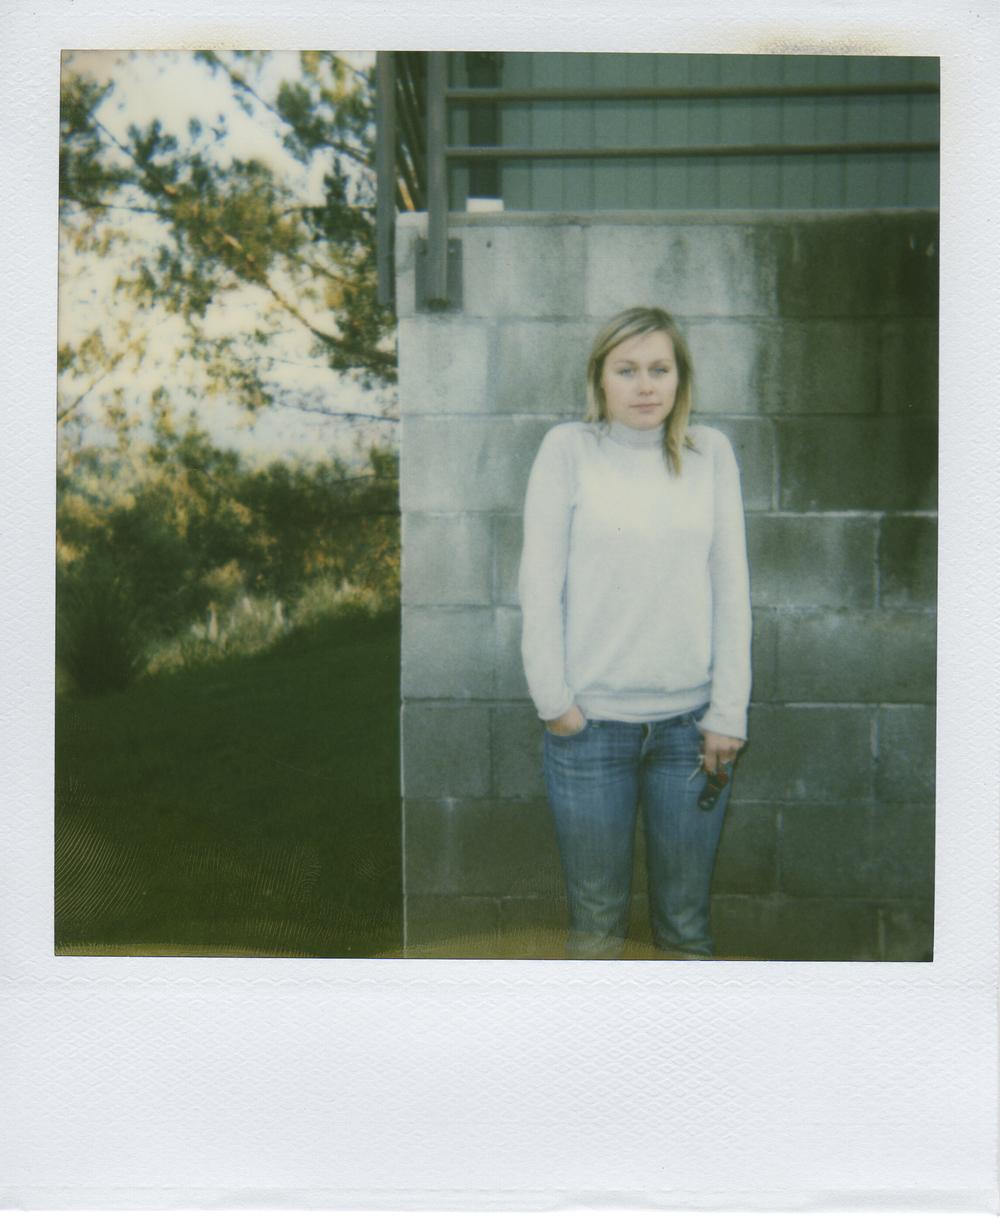 jlaurence-polaroid-064.jpg